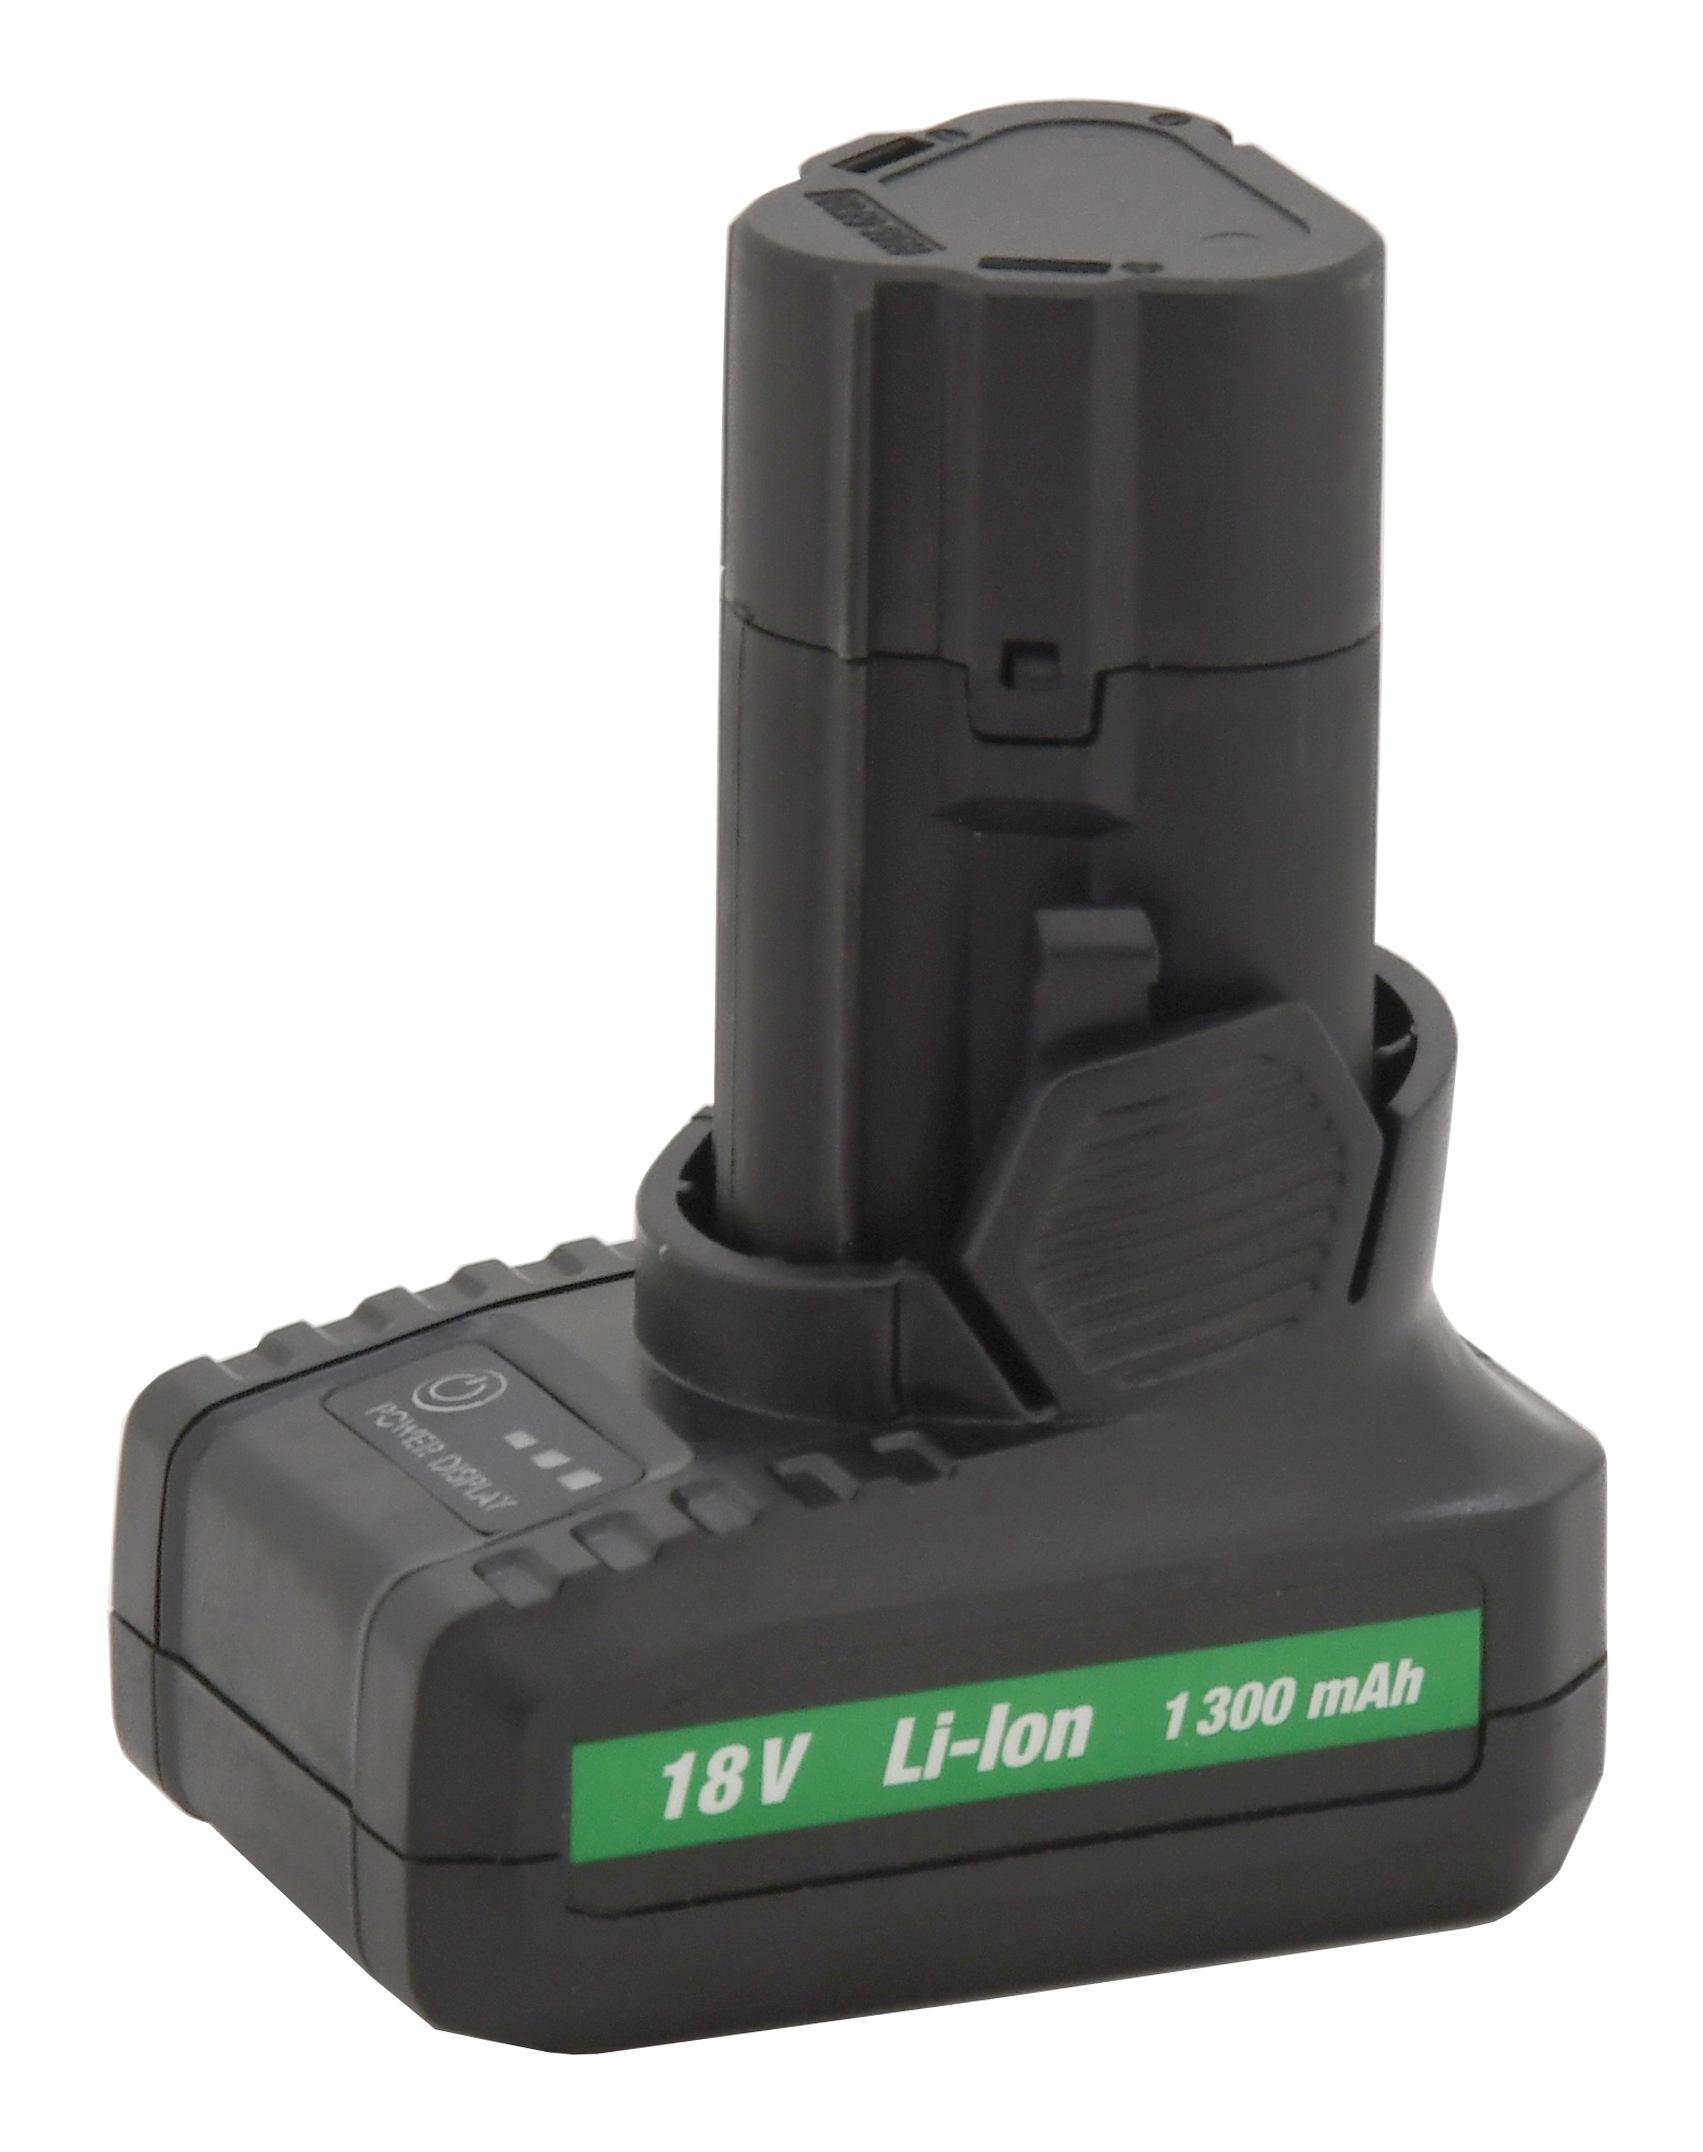 Akumulátor C-LION 18V Li-ion pro 09609